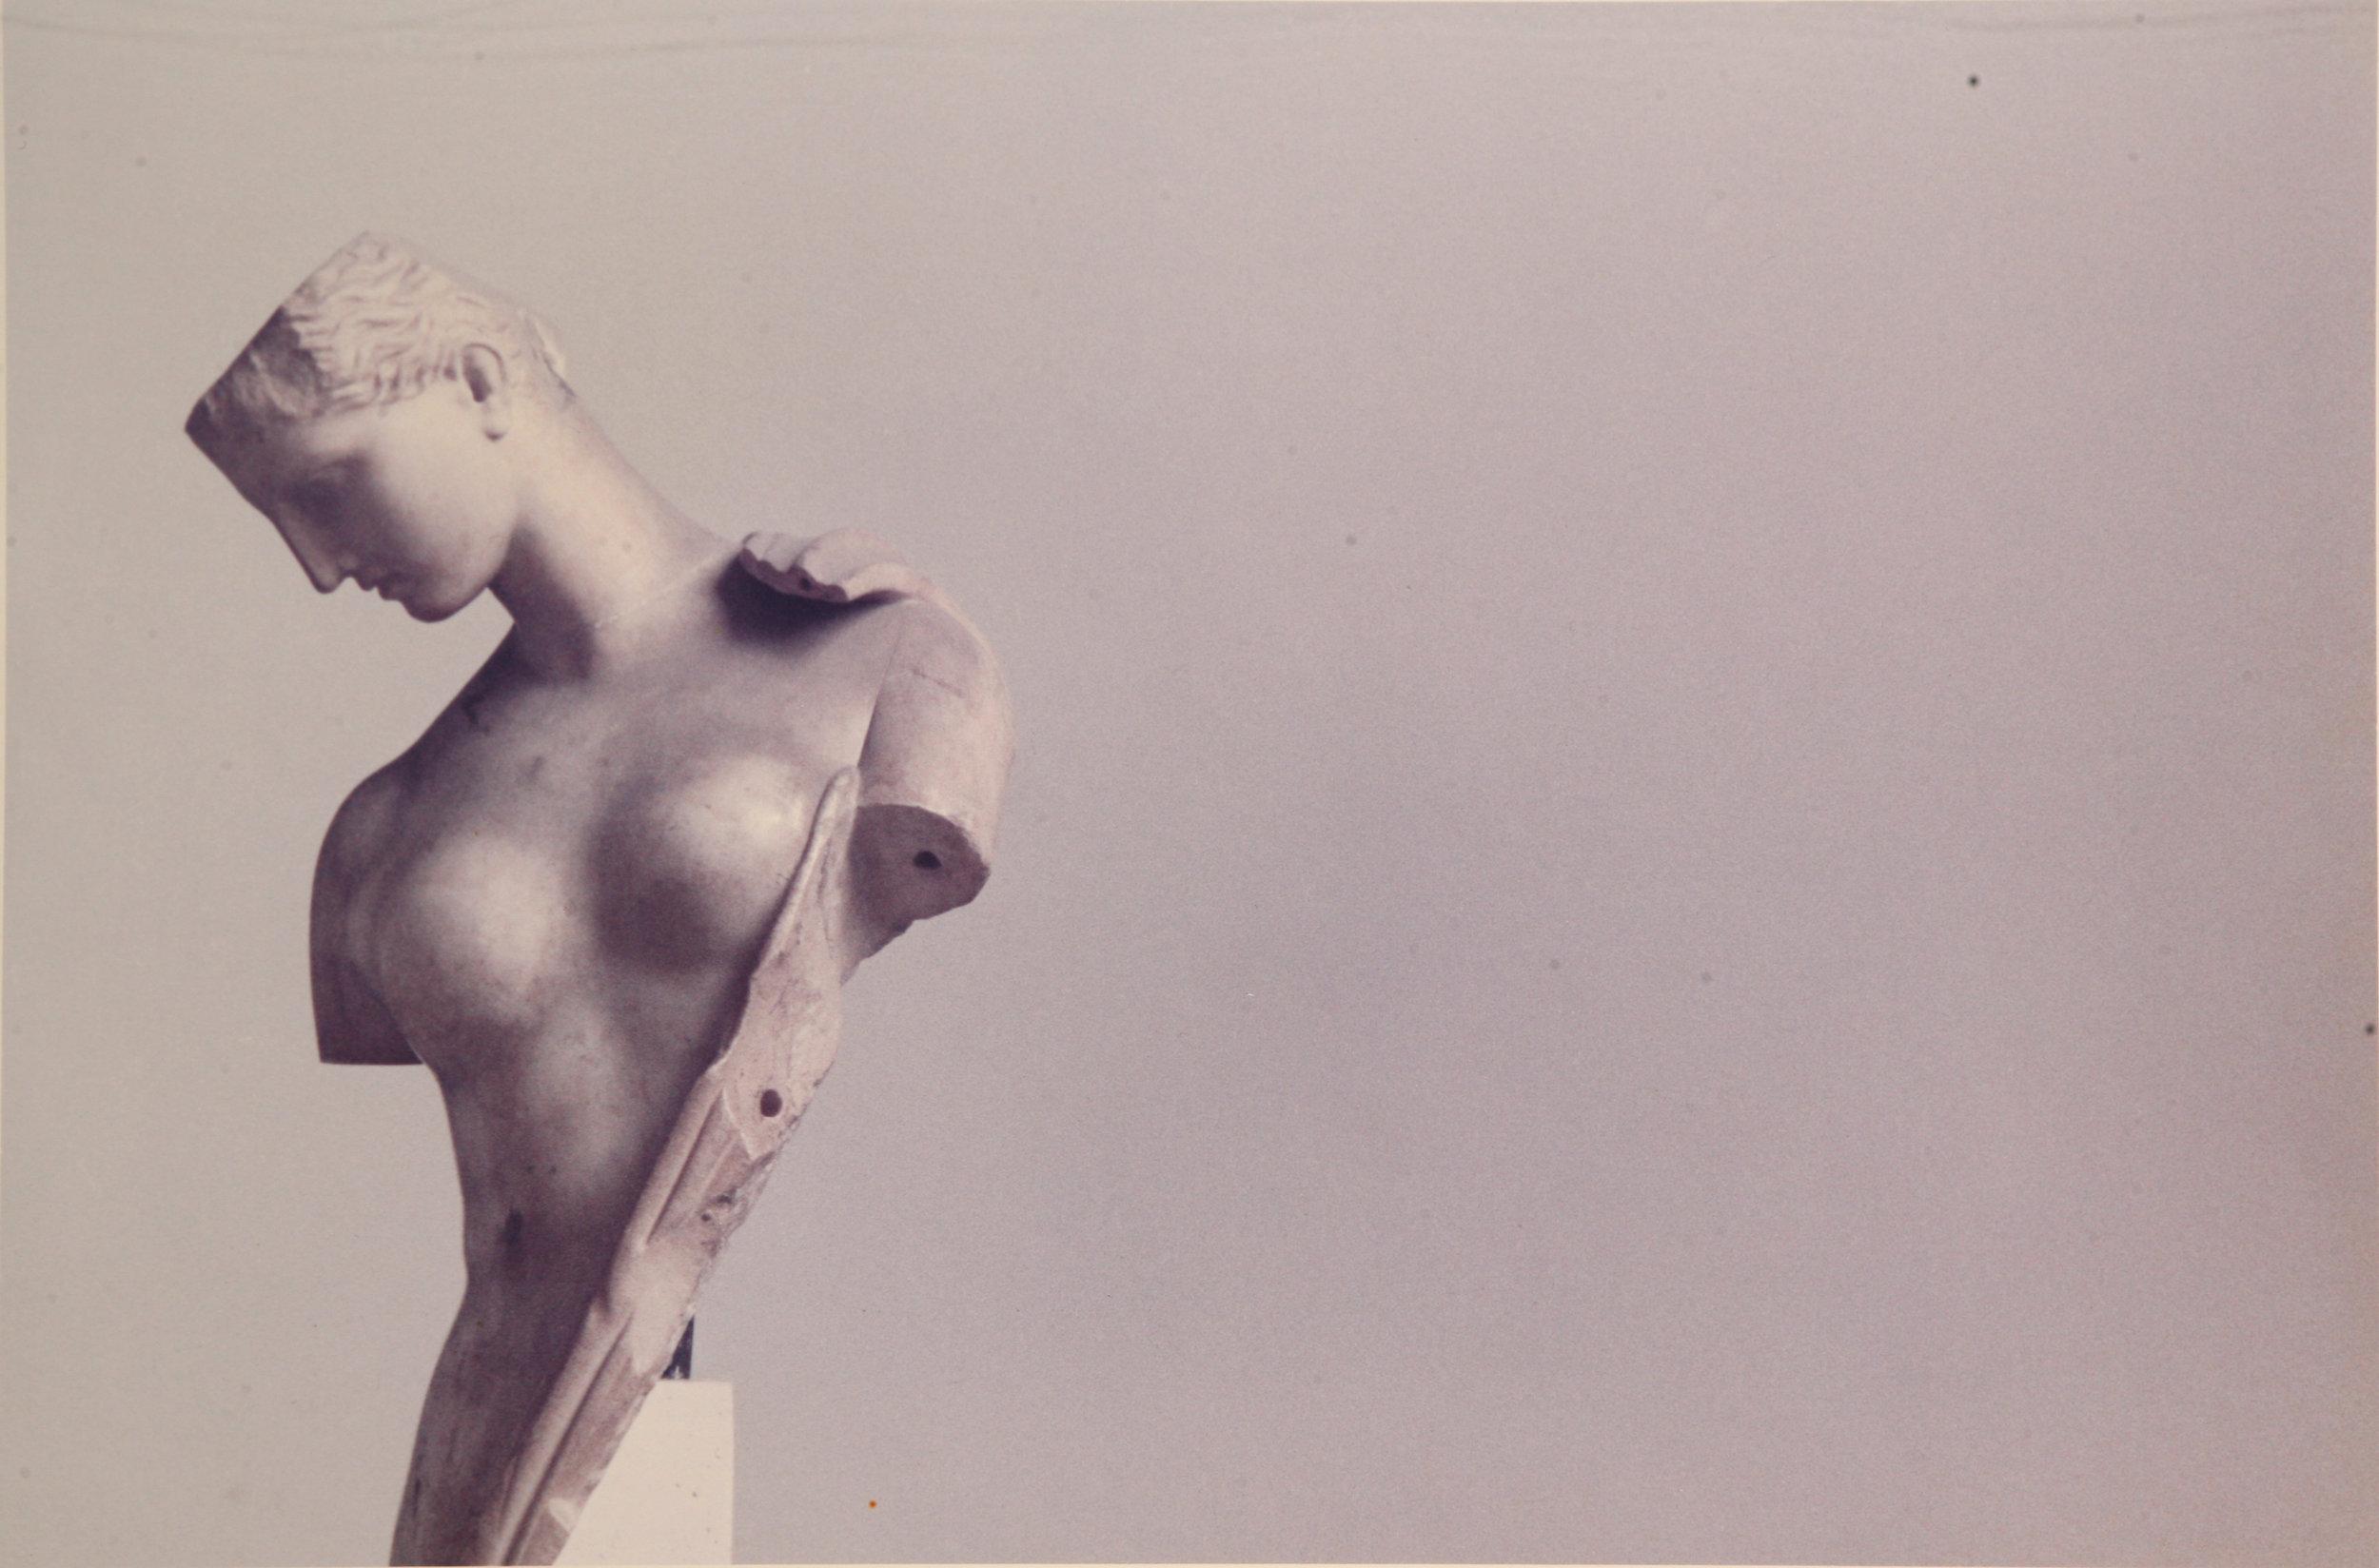 Photographica-FineArt_Ghirri_Napoli_1981.JPG